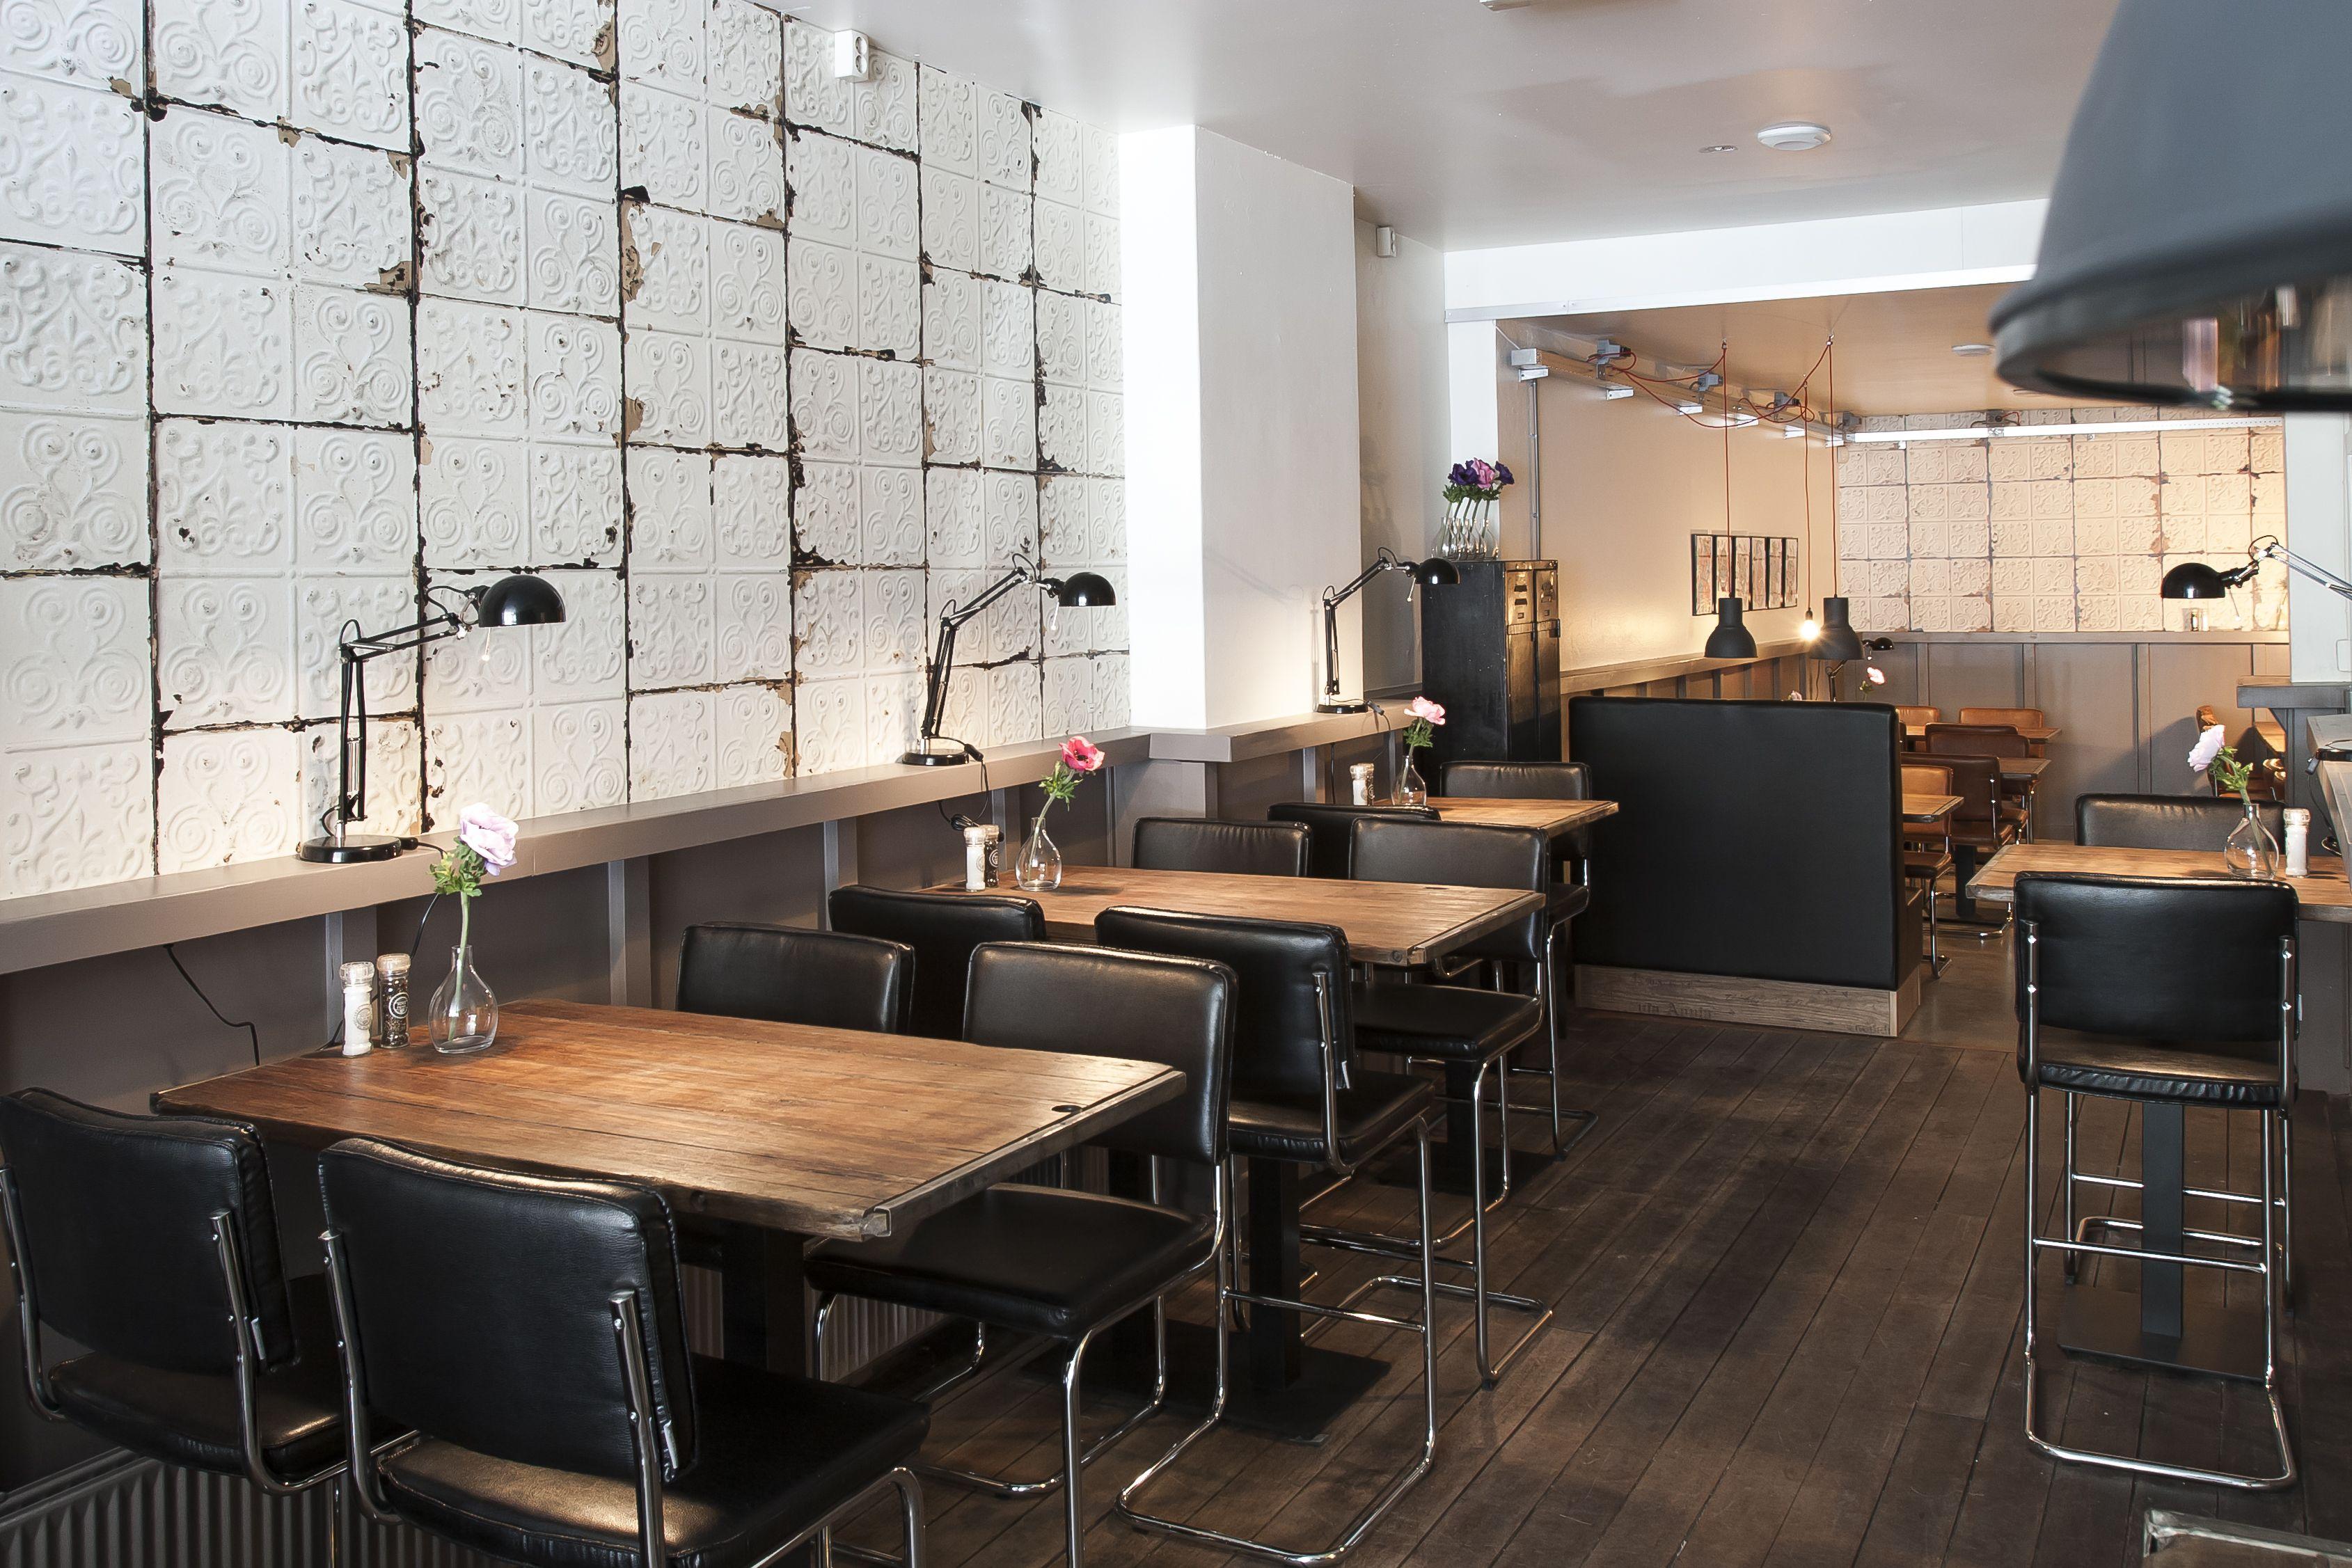 Interieur restaurant De Spil Dine & Wine Nijmegen   Cafe   Pinterest ...